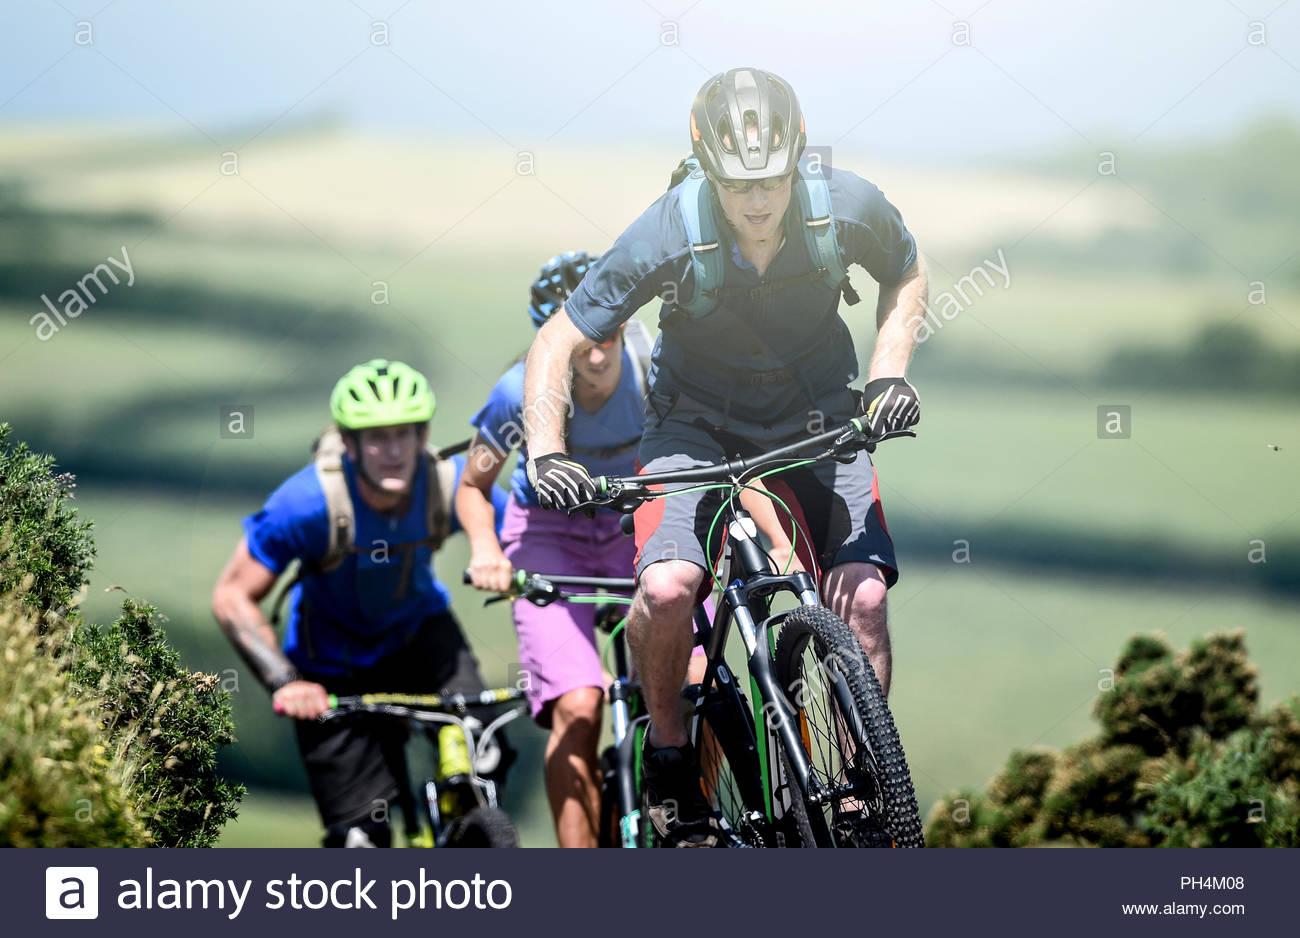 Friends mountain biking in Porlock Weir, England - Stock Image